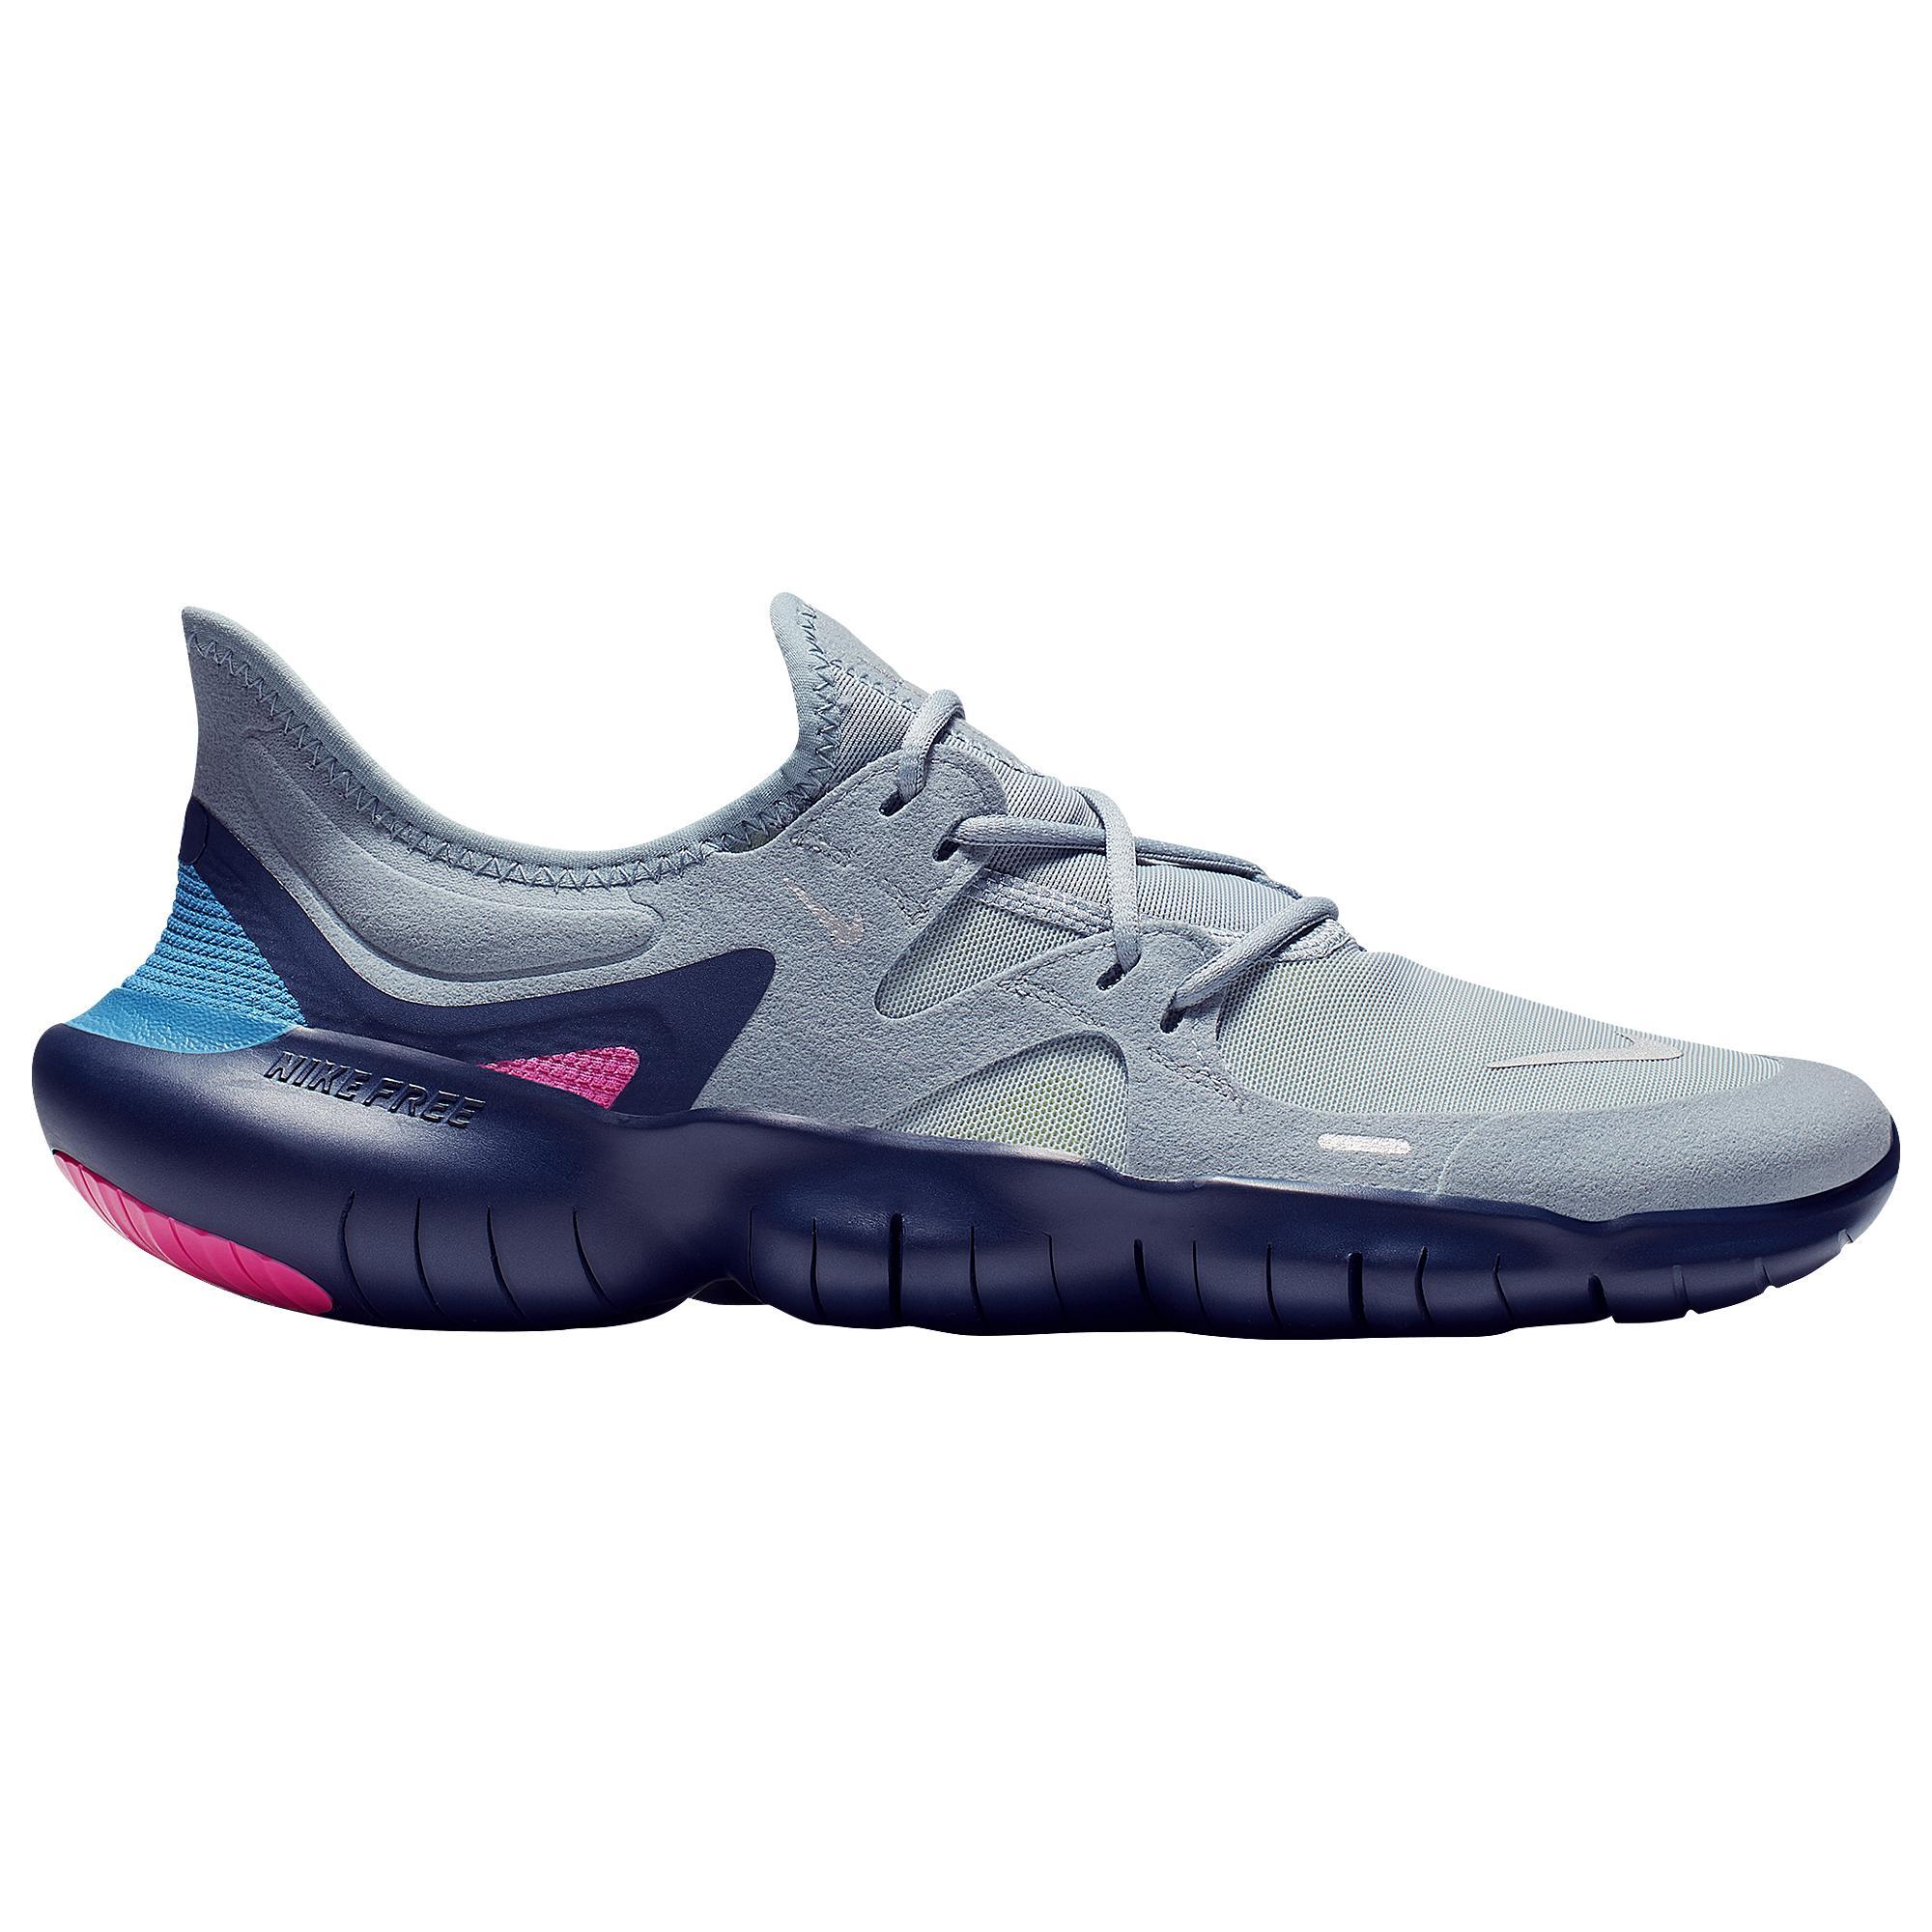 finest selection c8eca 461b5 Nike Free Rn 5.0 in Blue for Men - Lyst